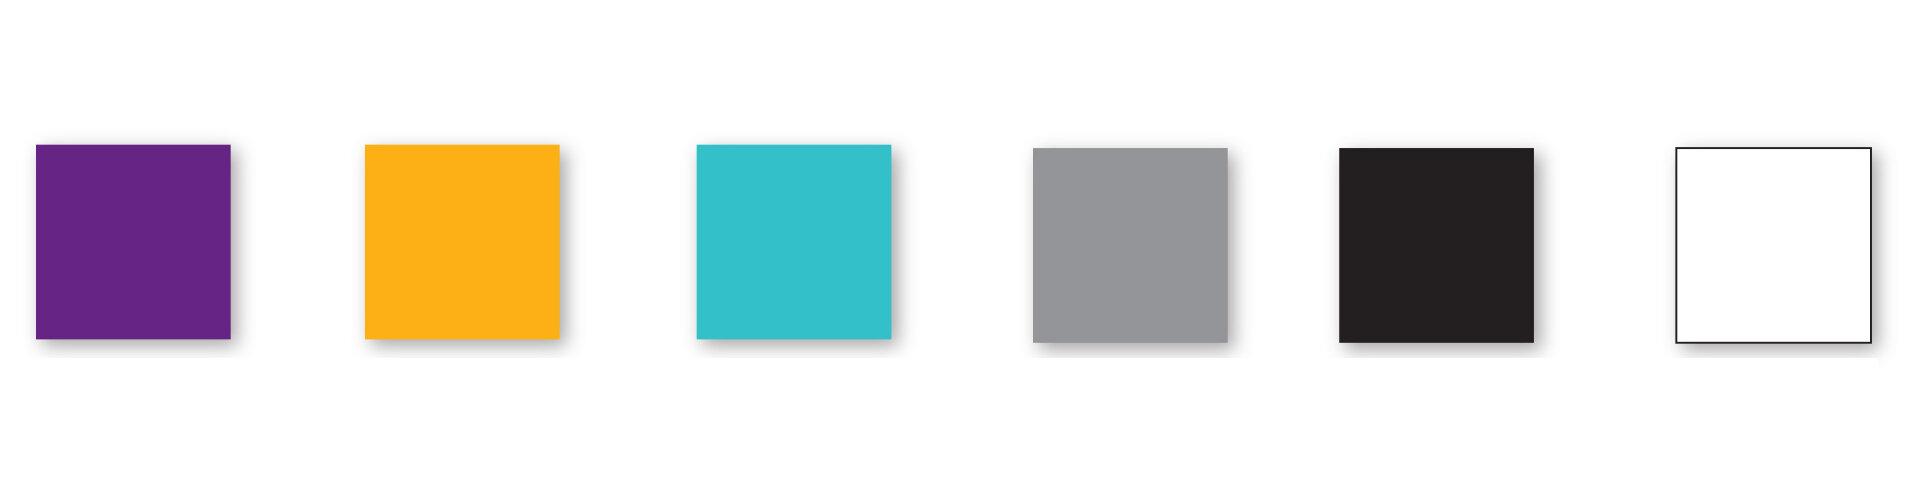 Next Vacay Colors.jpg